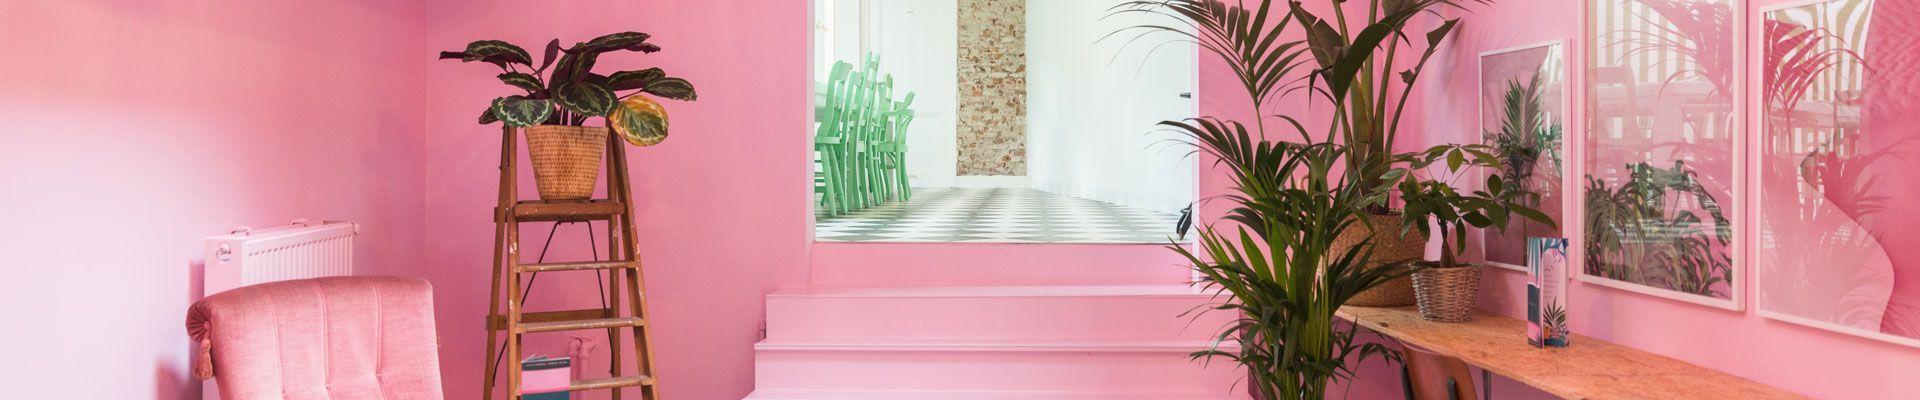 Woontrend: Millennial Pink